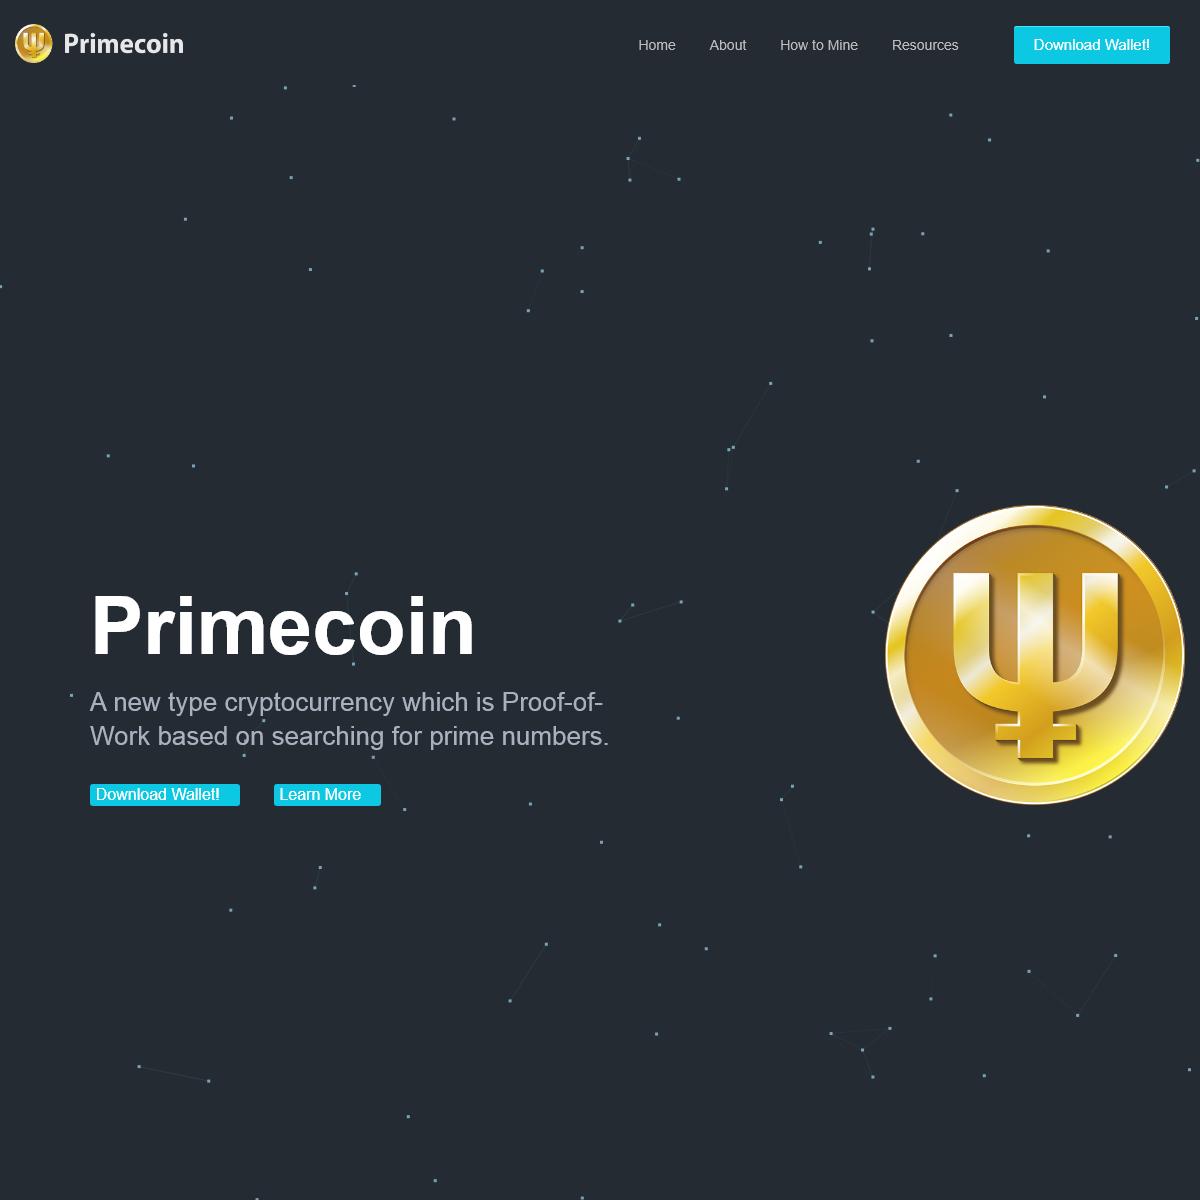 Primecoin